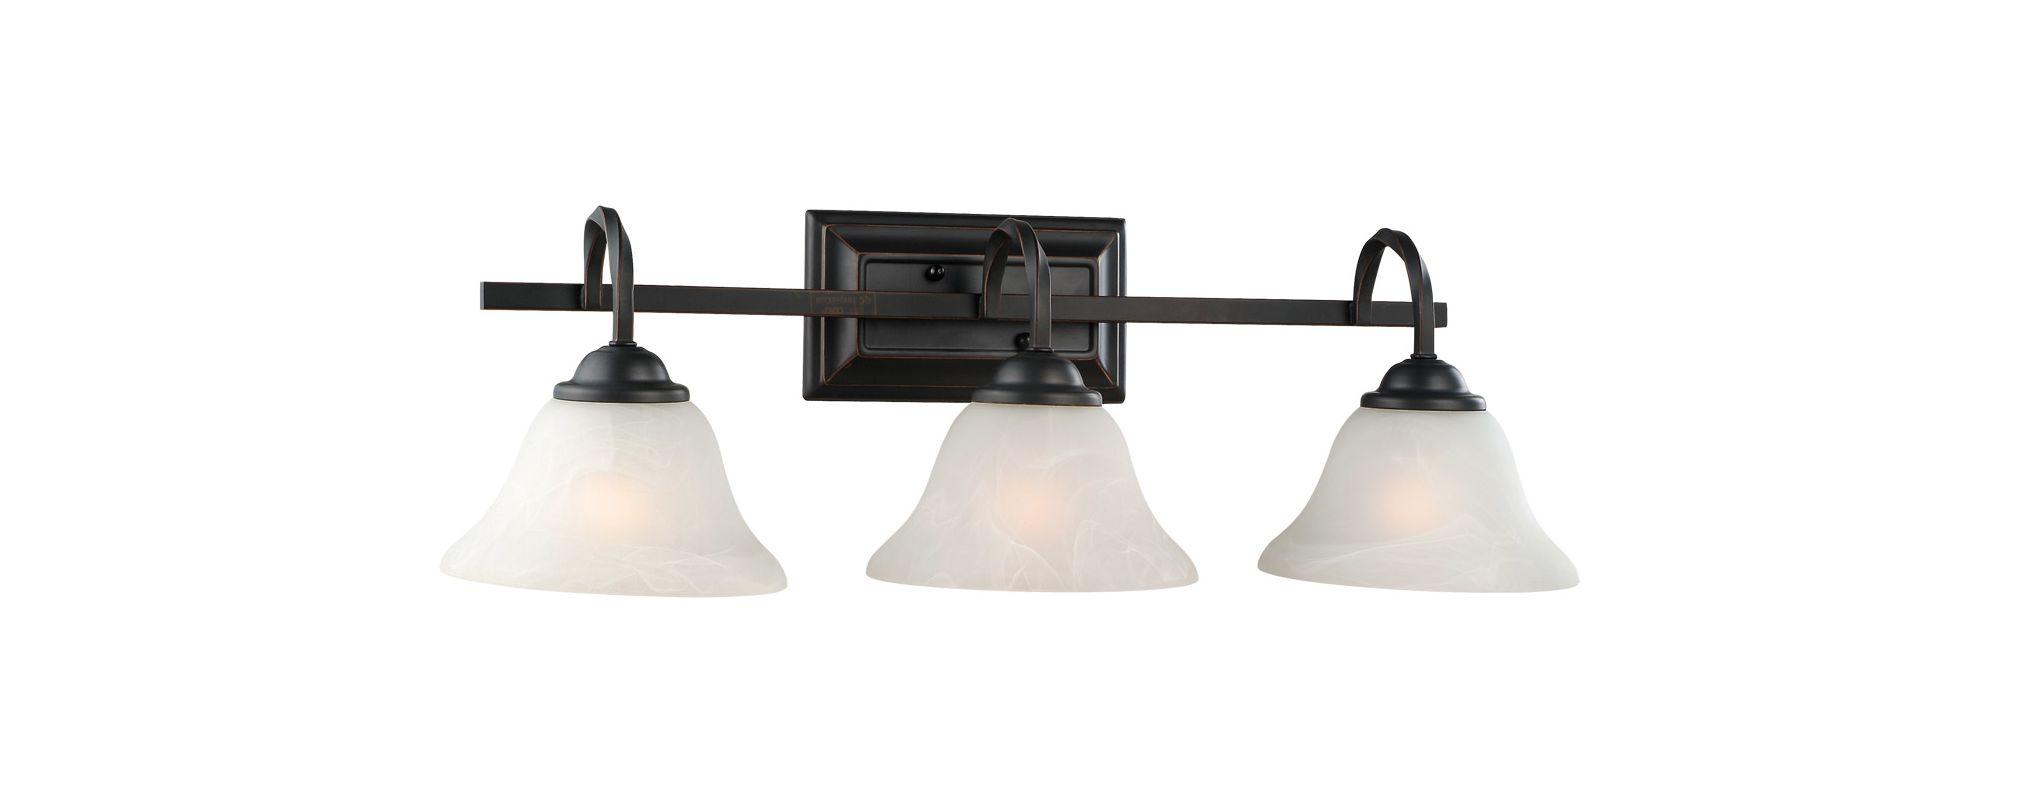 Design House 514901 Oil Rubbed Bronze Bathroom Light